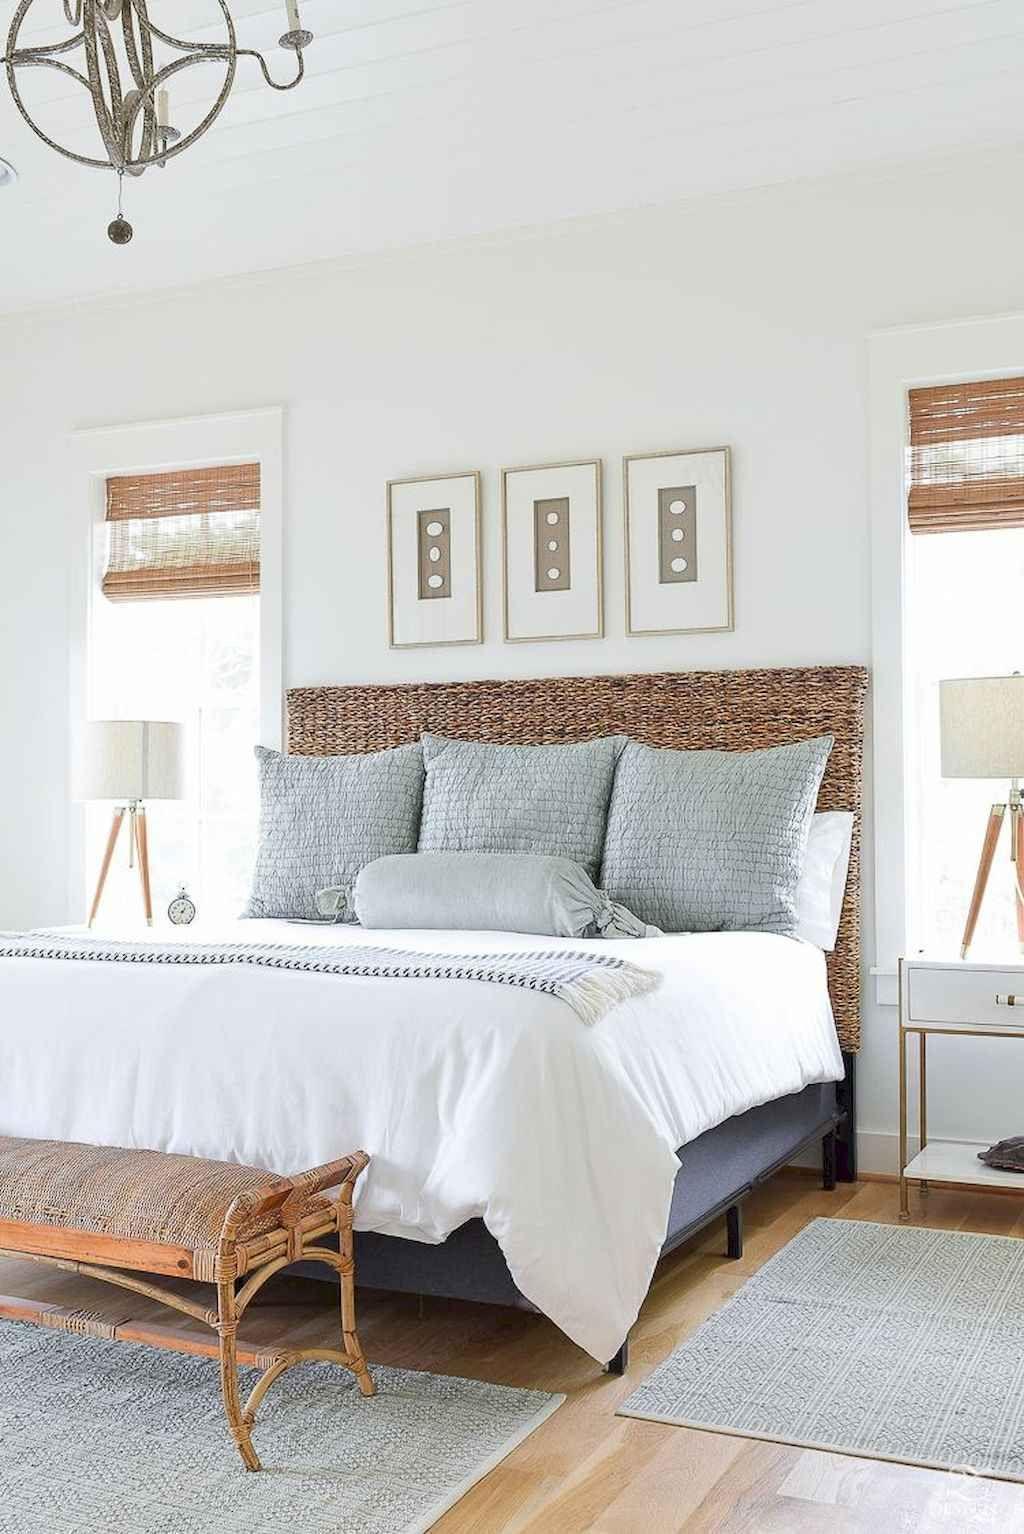 60 Rustic Coastal Master Bedroom Ideas Coastal Master Bedroom